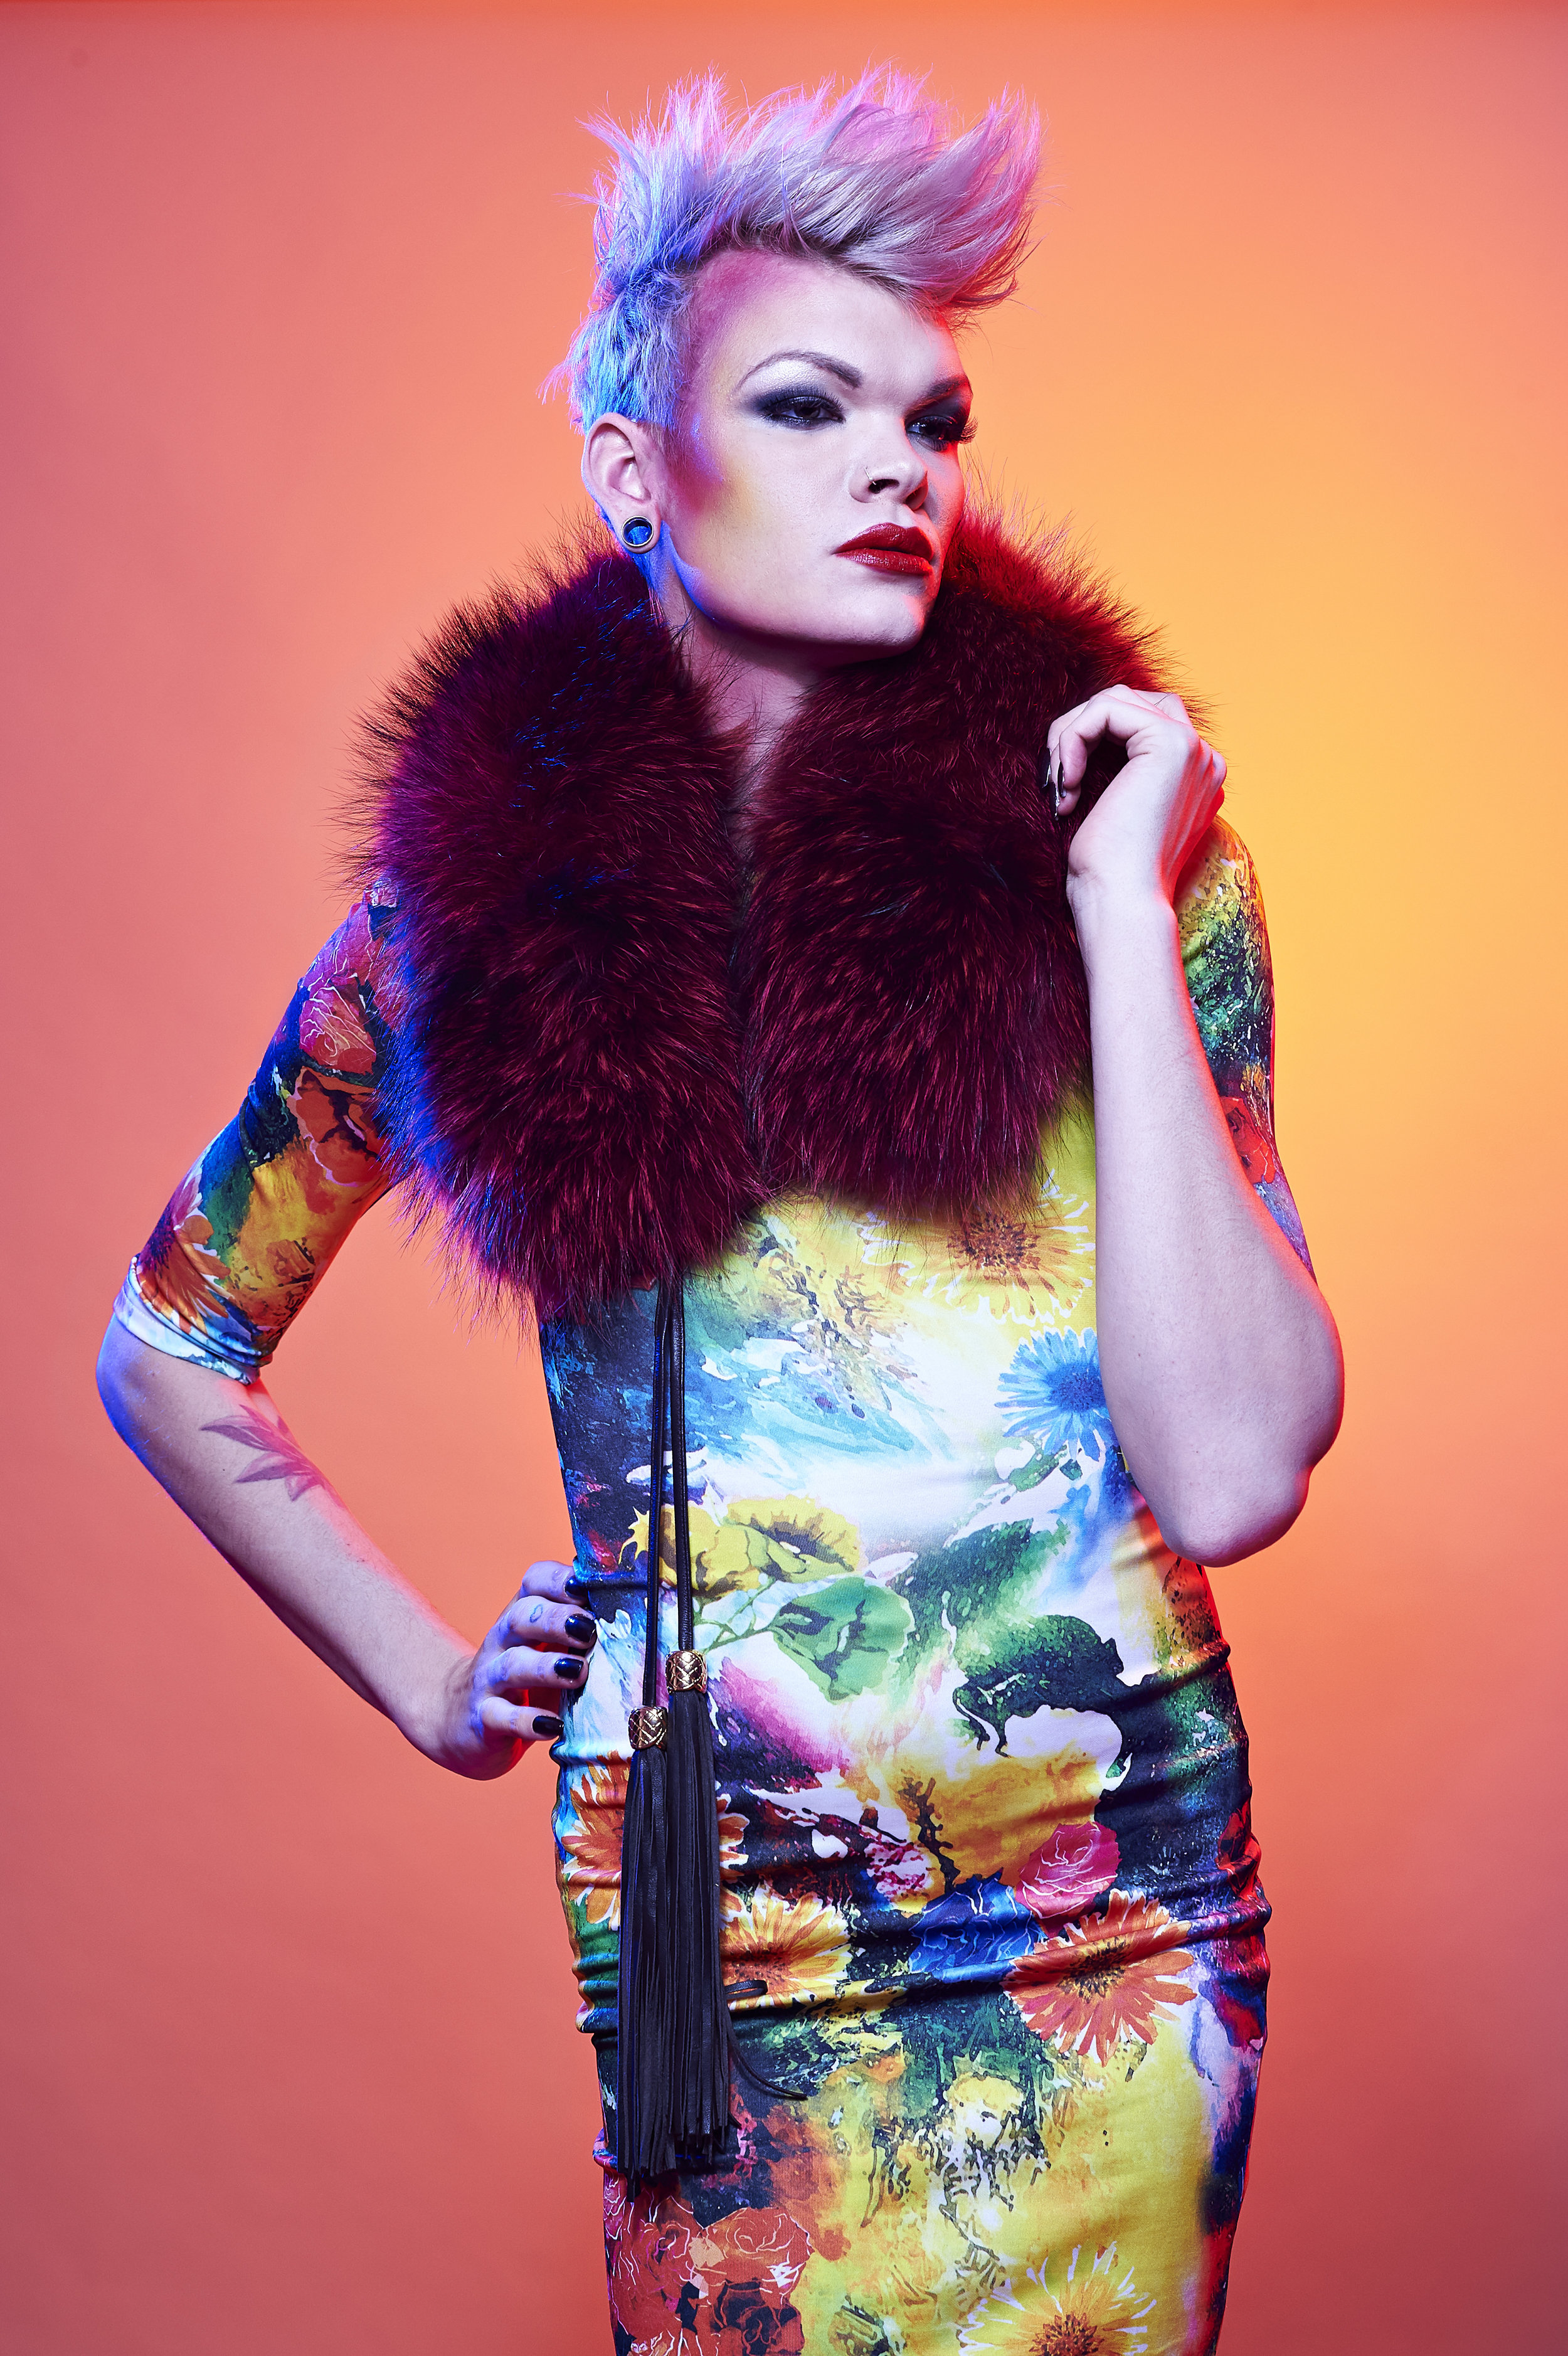 Marta-Hewson  - Urbanicity - David Bowie1568.jpg